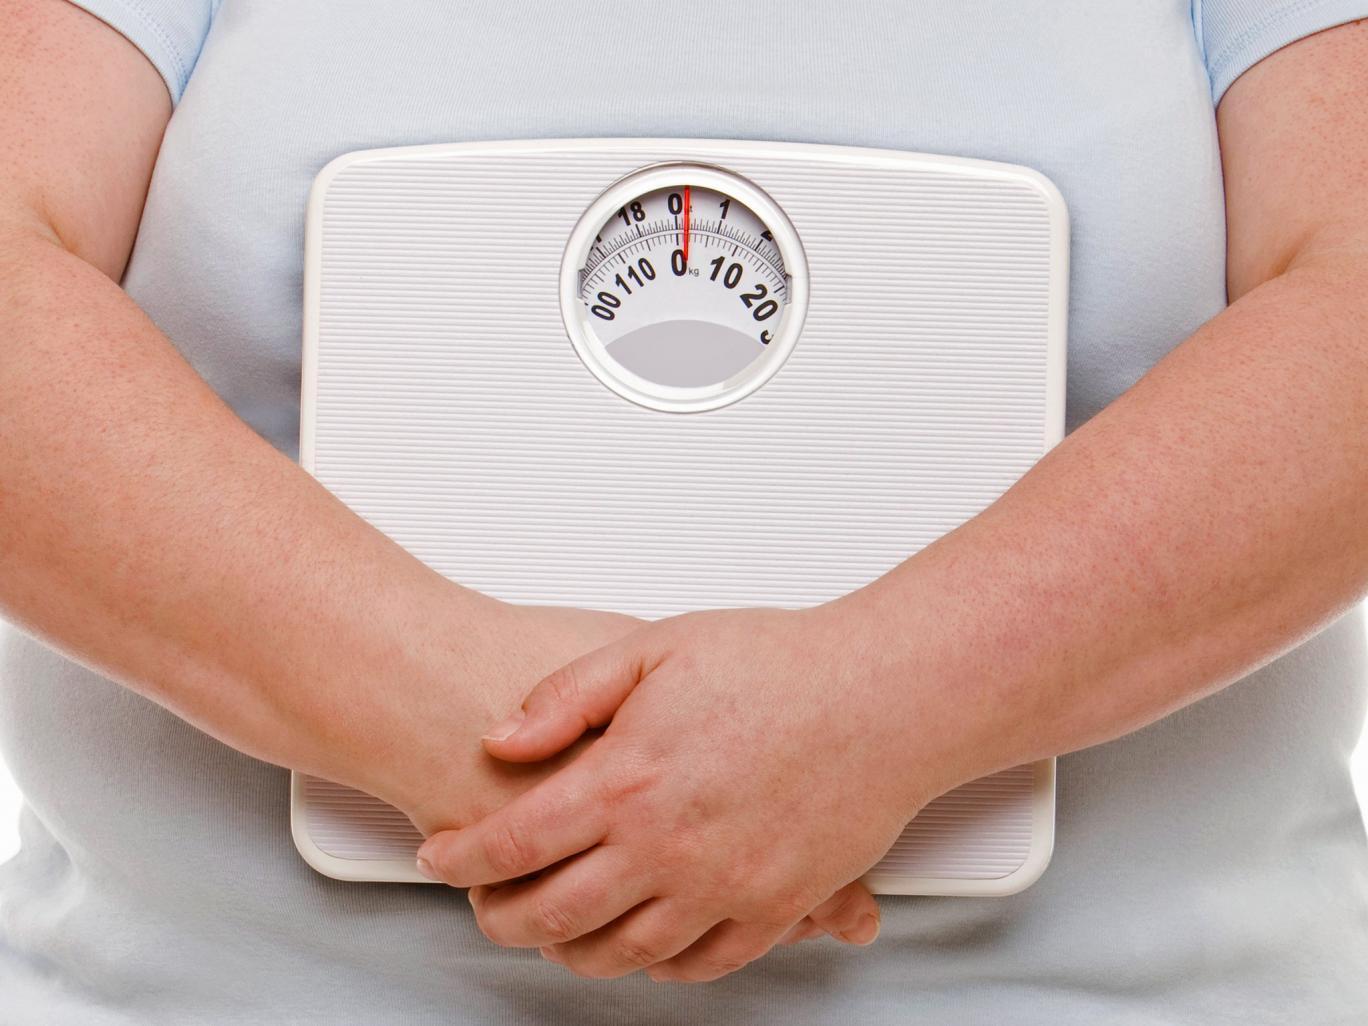 Shred matrix fat loss photo 3